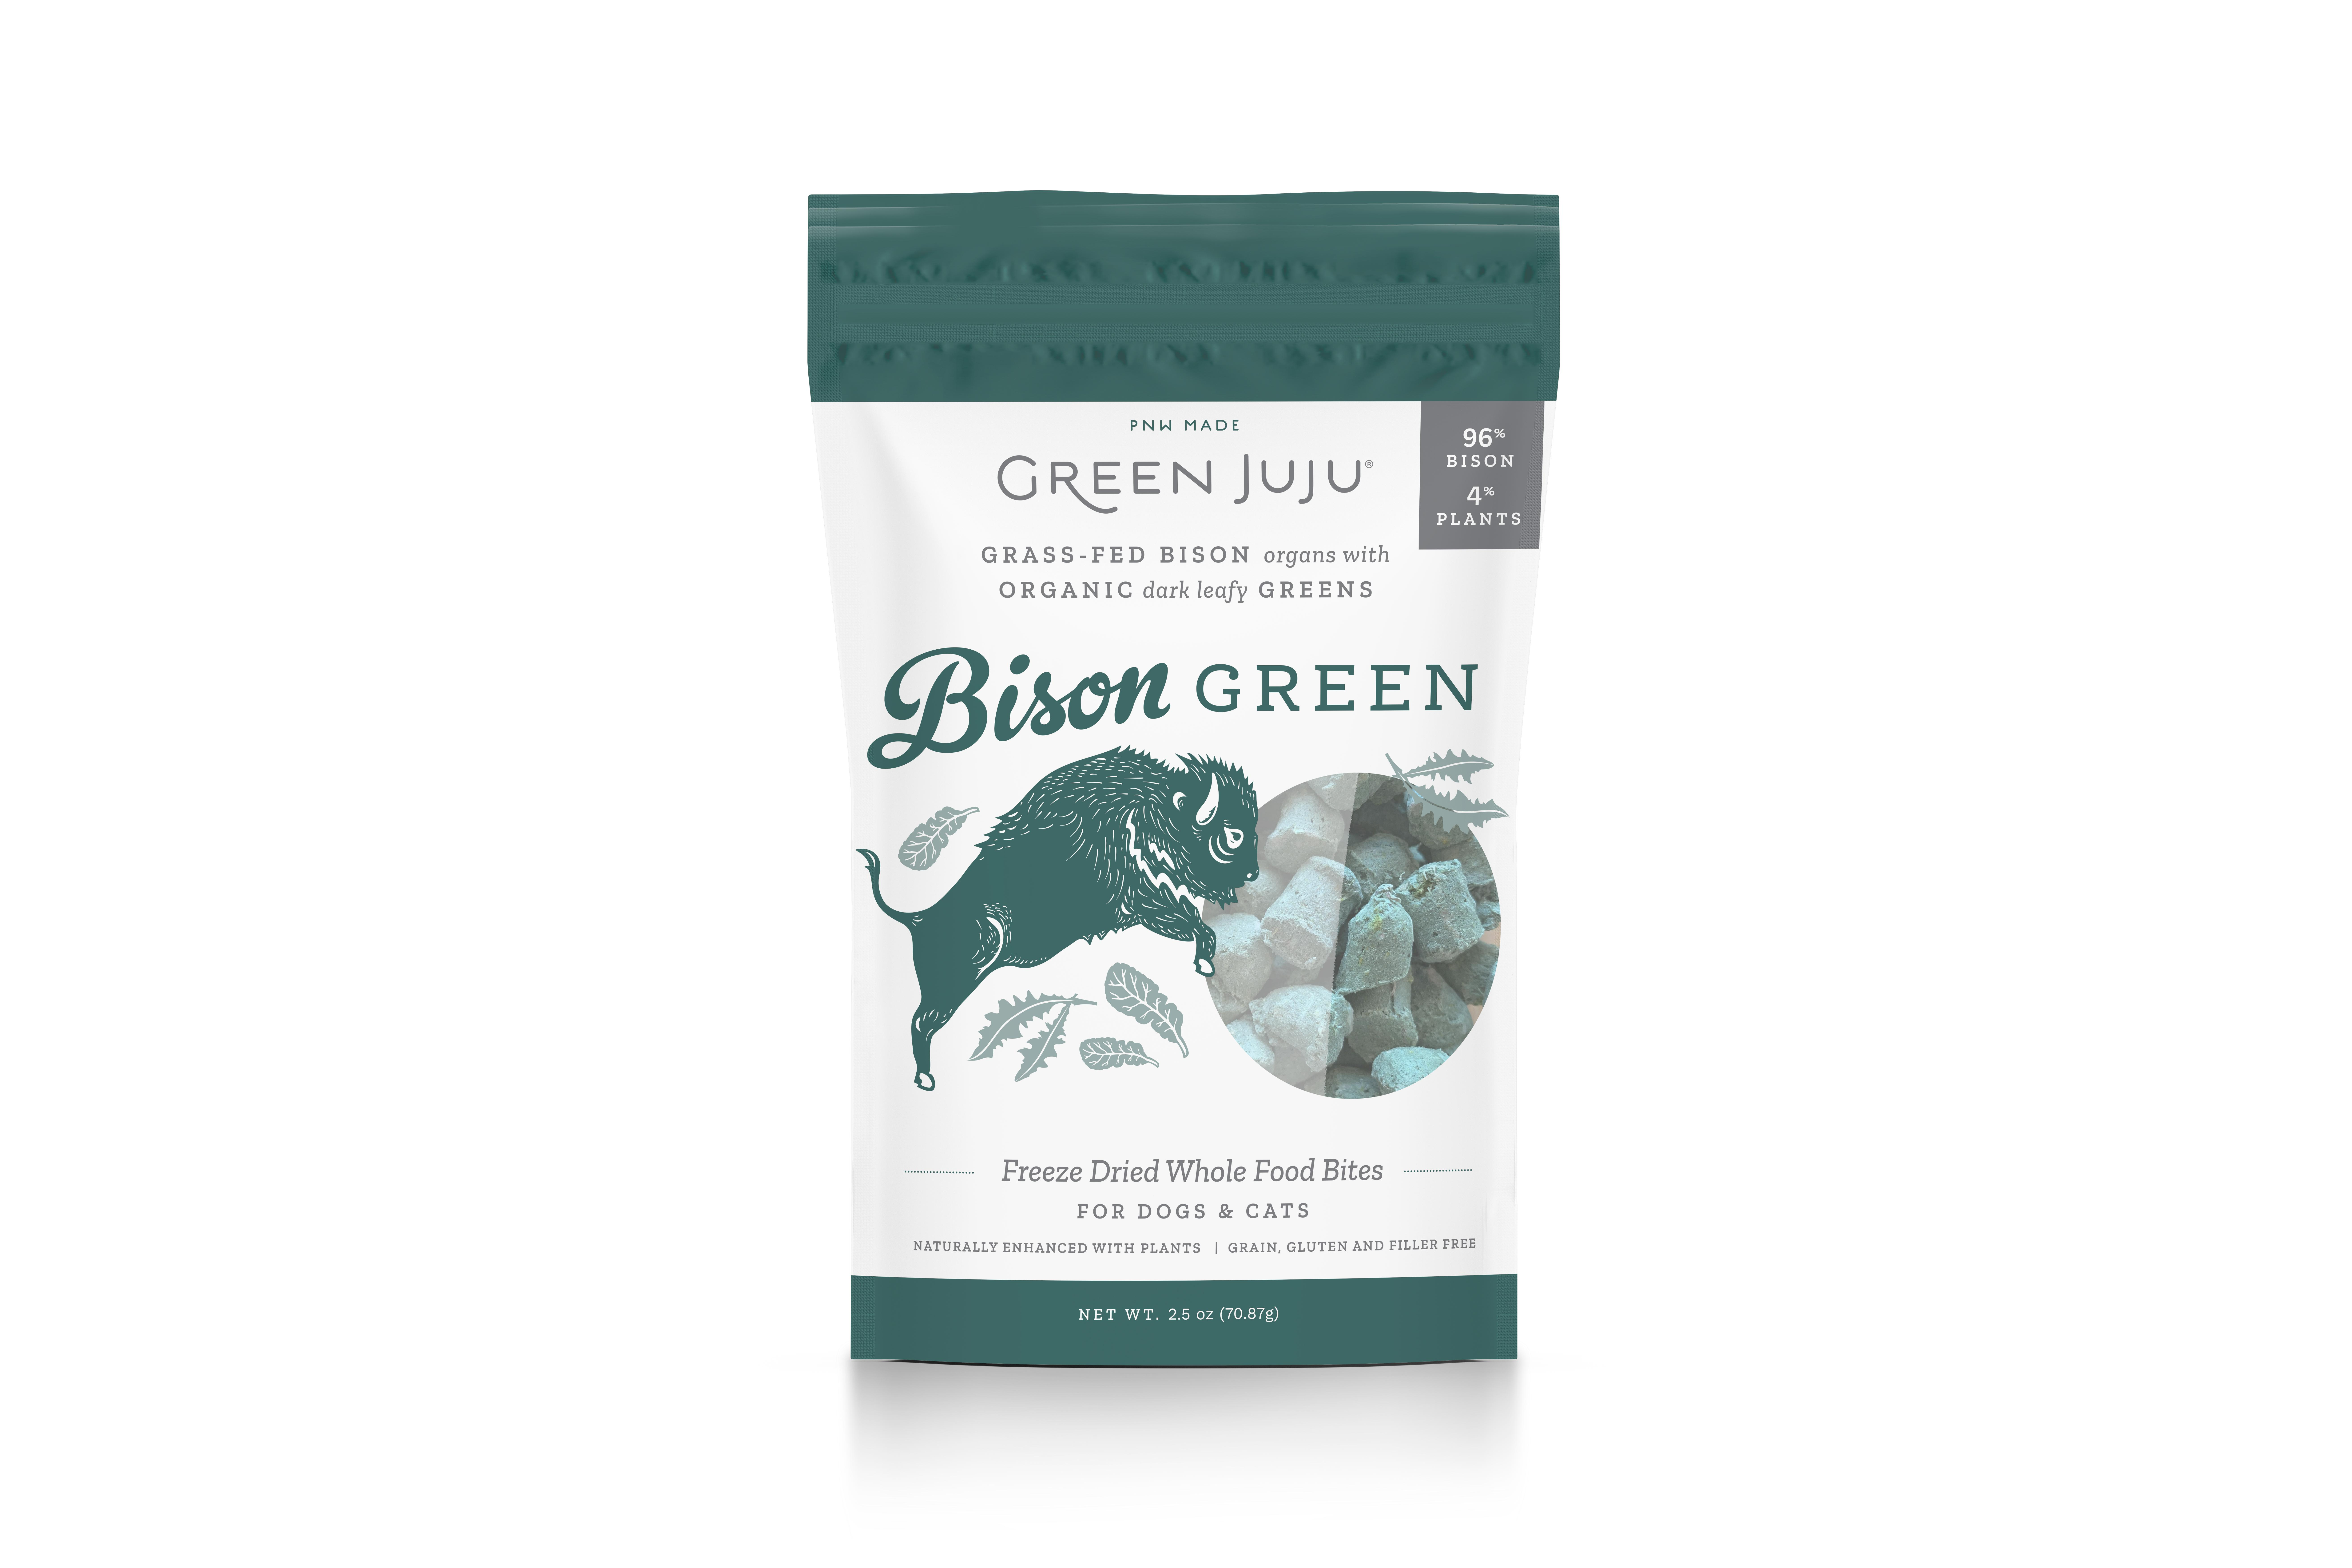 Green Juju Bison Green Freeze-Dried Dog & Cat Treats, 2.5-oz